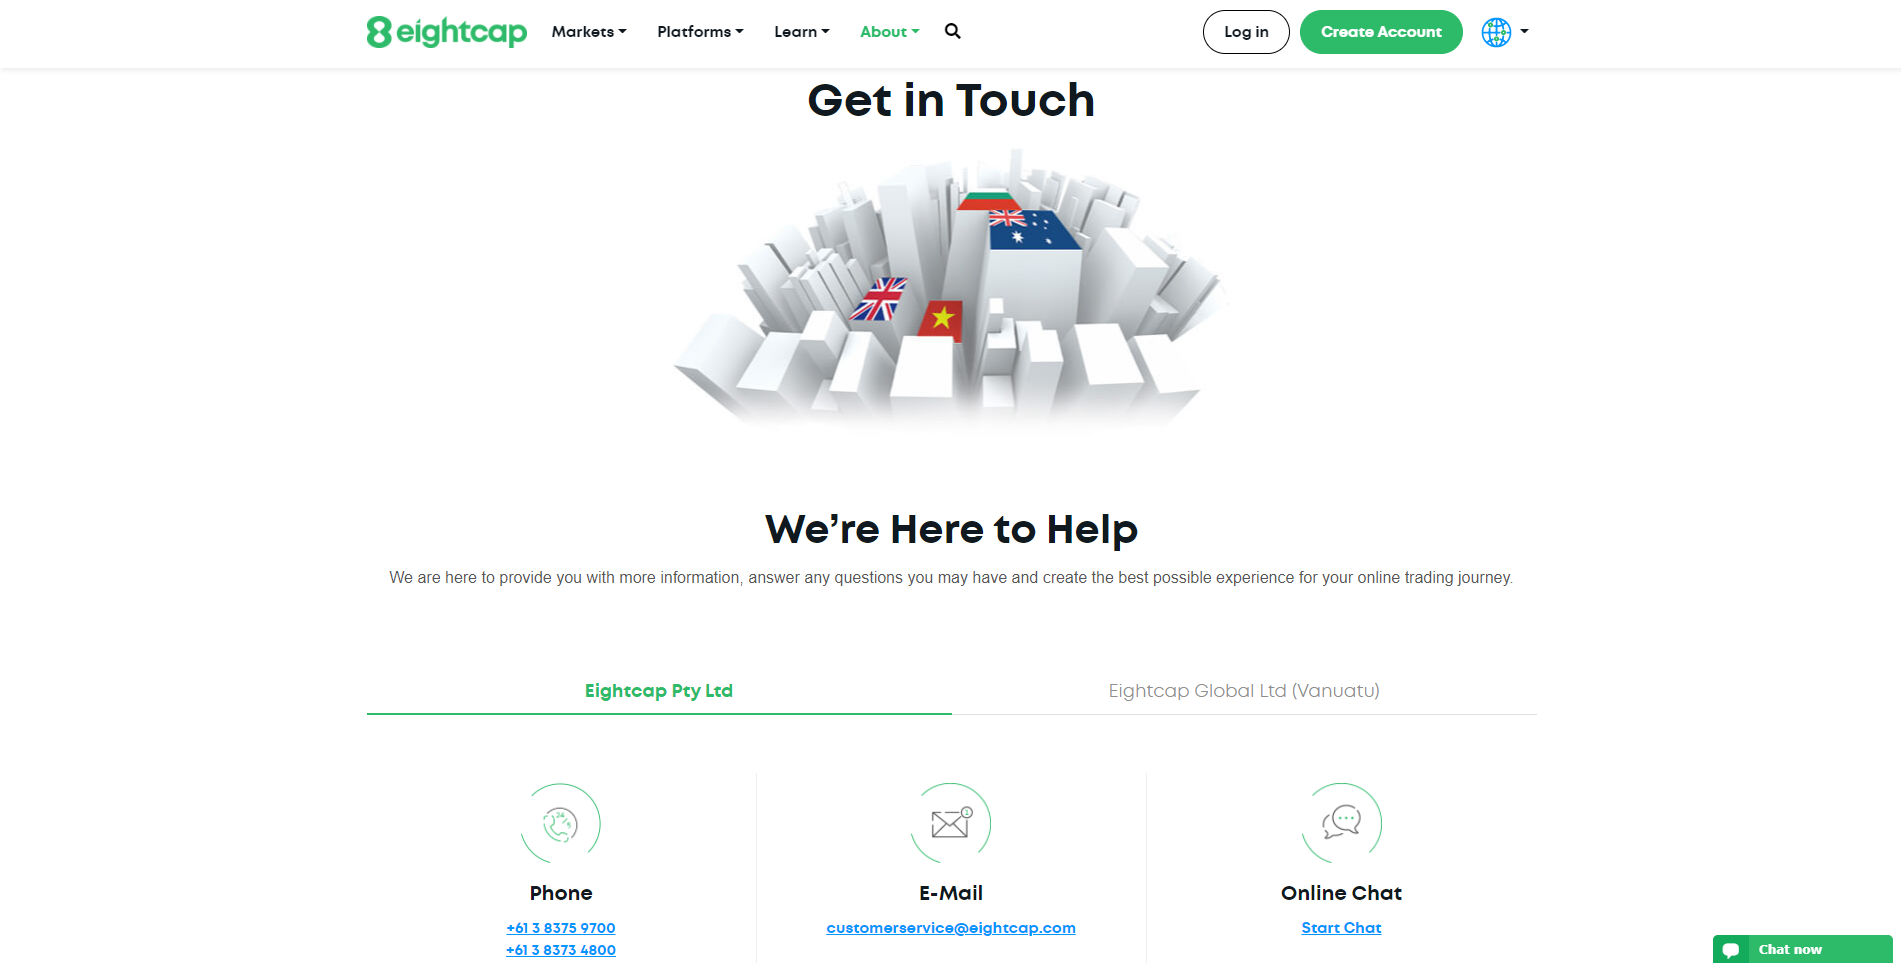 Eightcap review - Customer Service